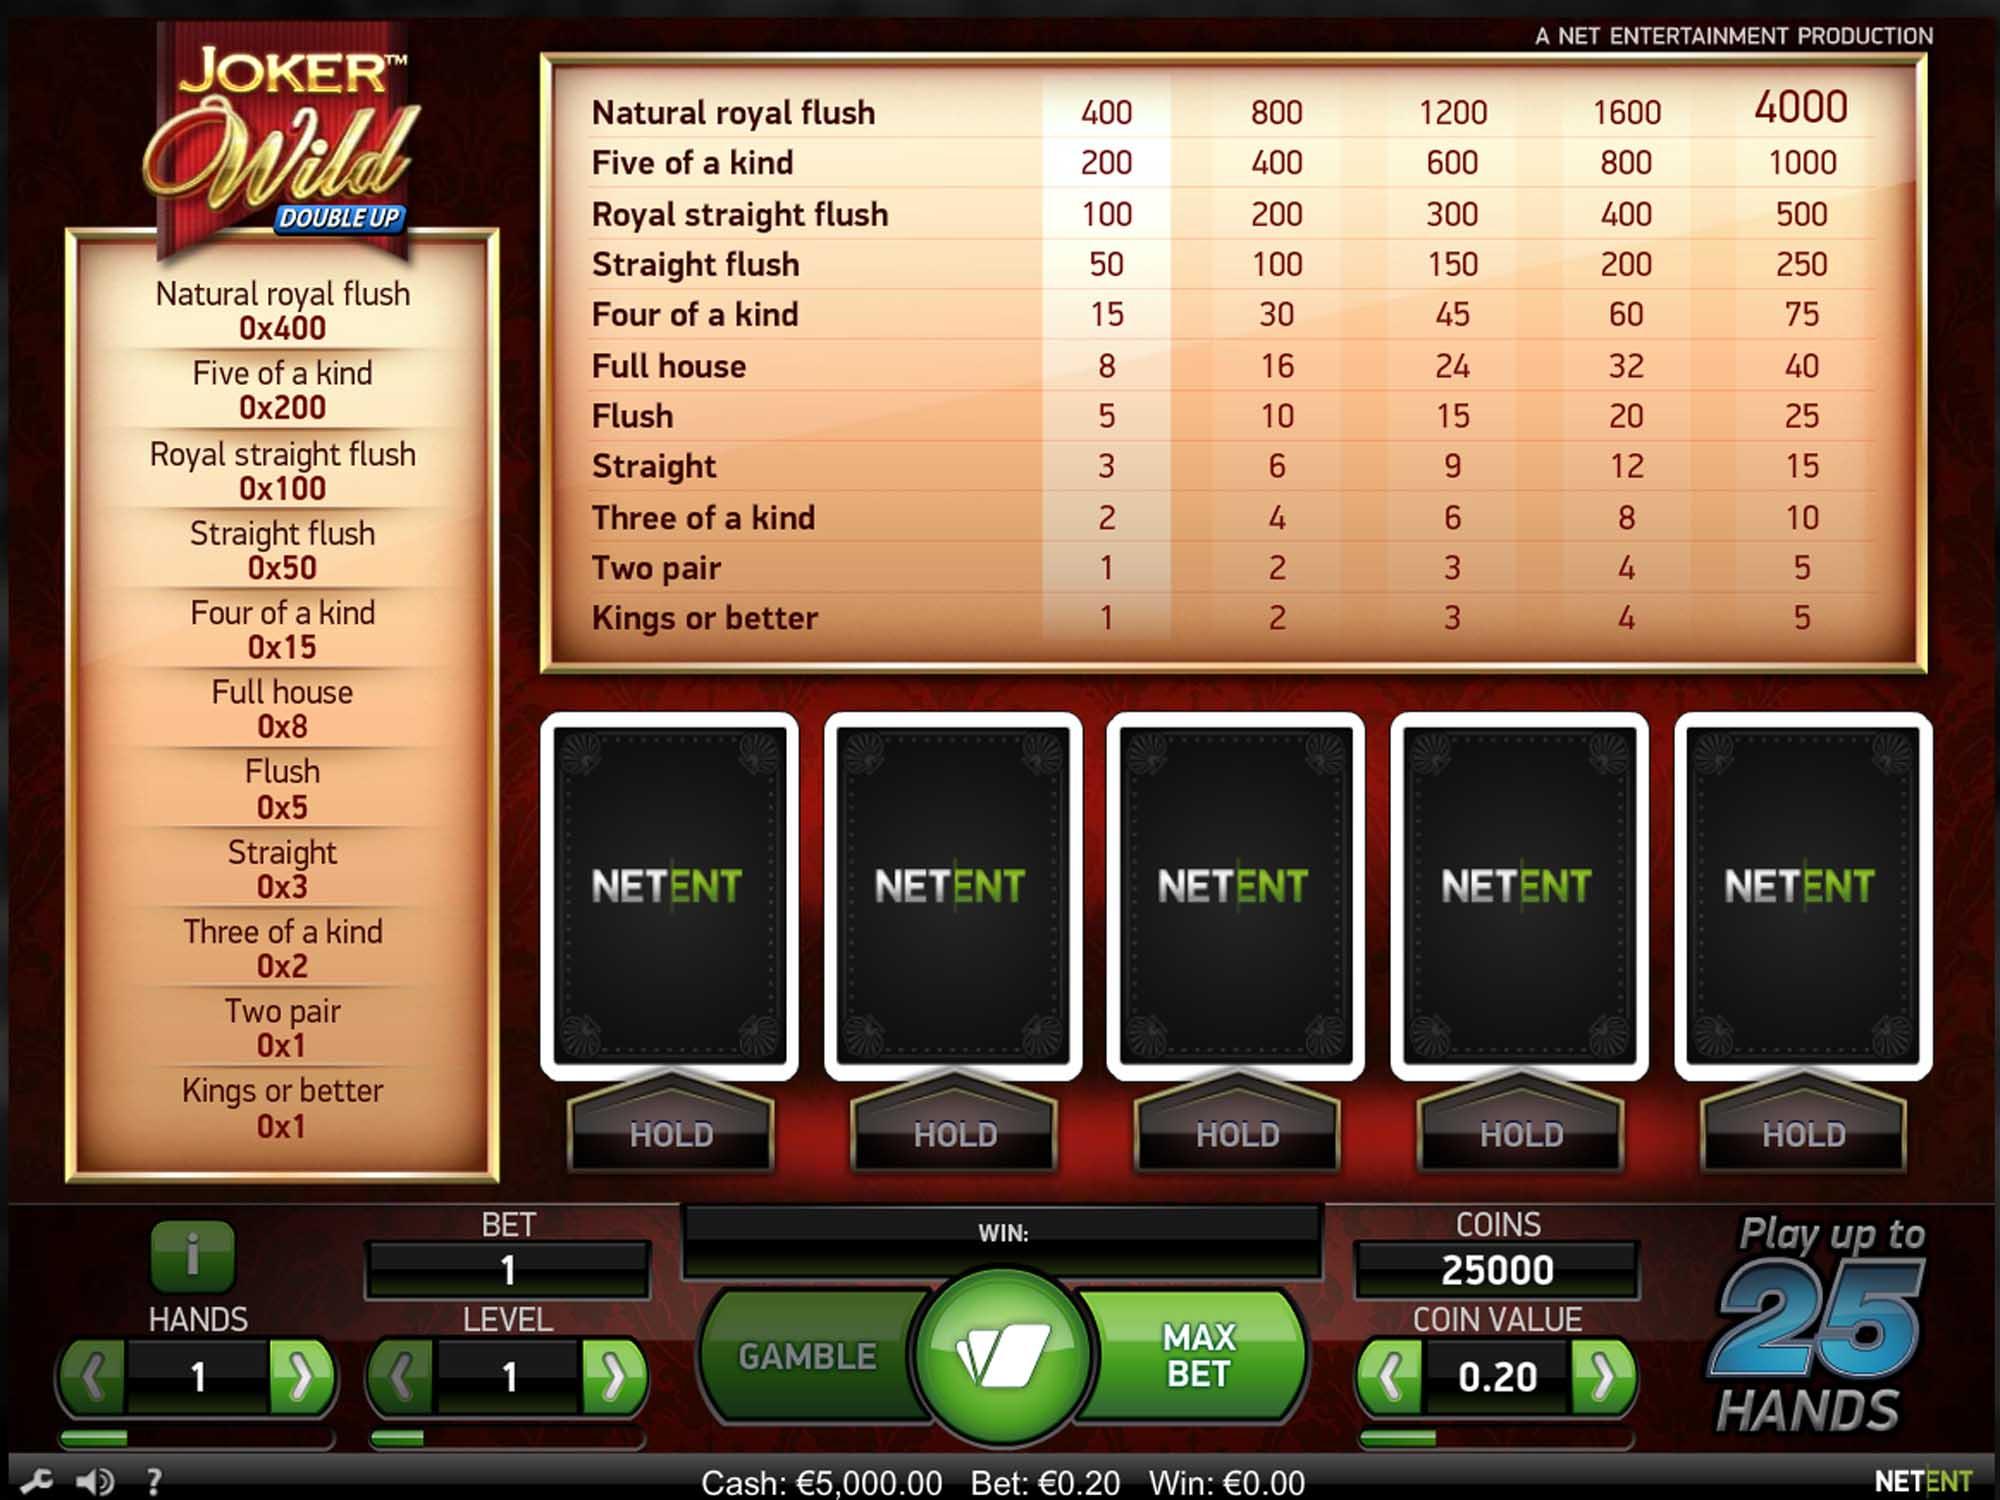 NetEnt Joker Wild Double Up Video Poker screenshot